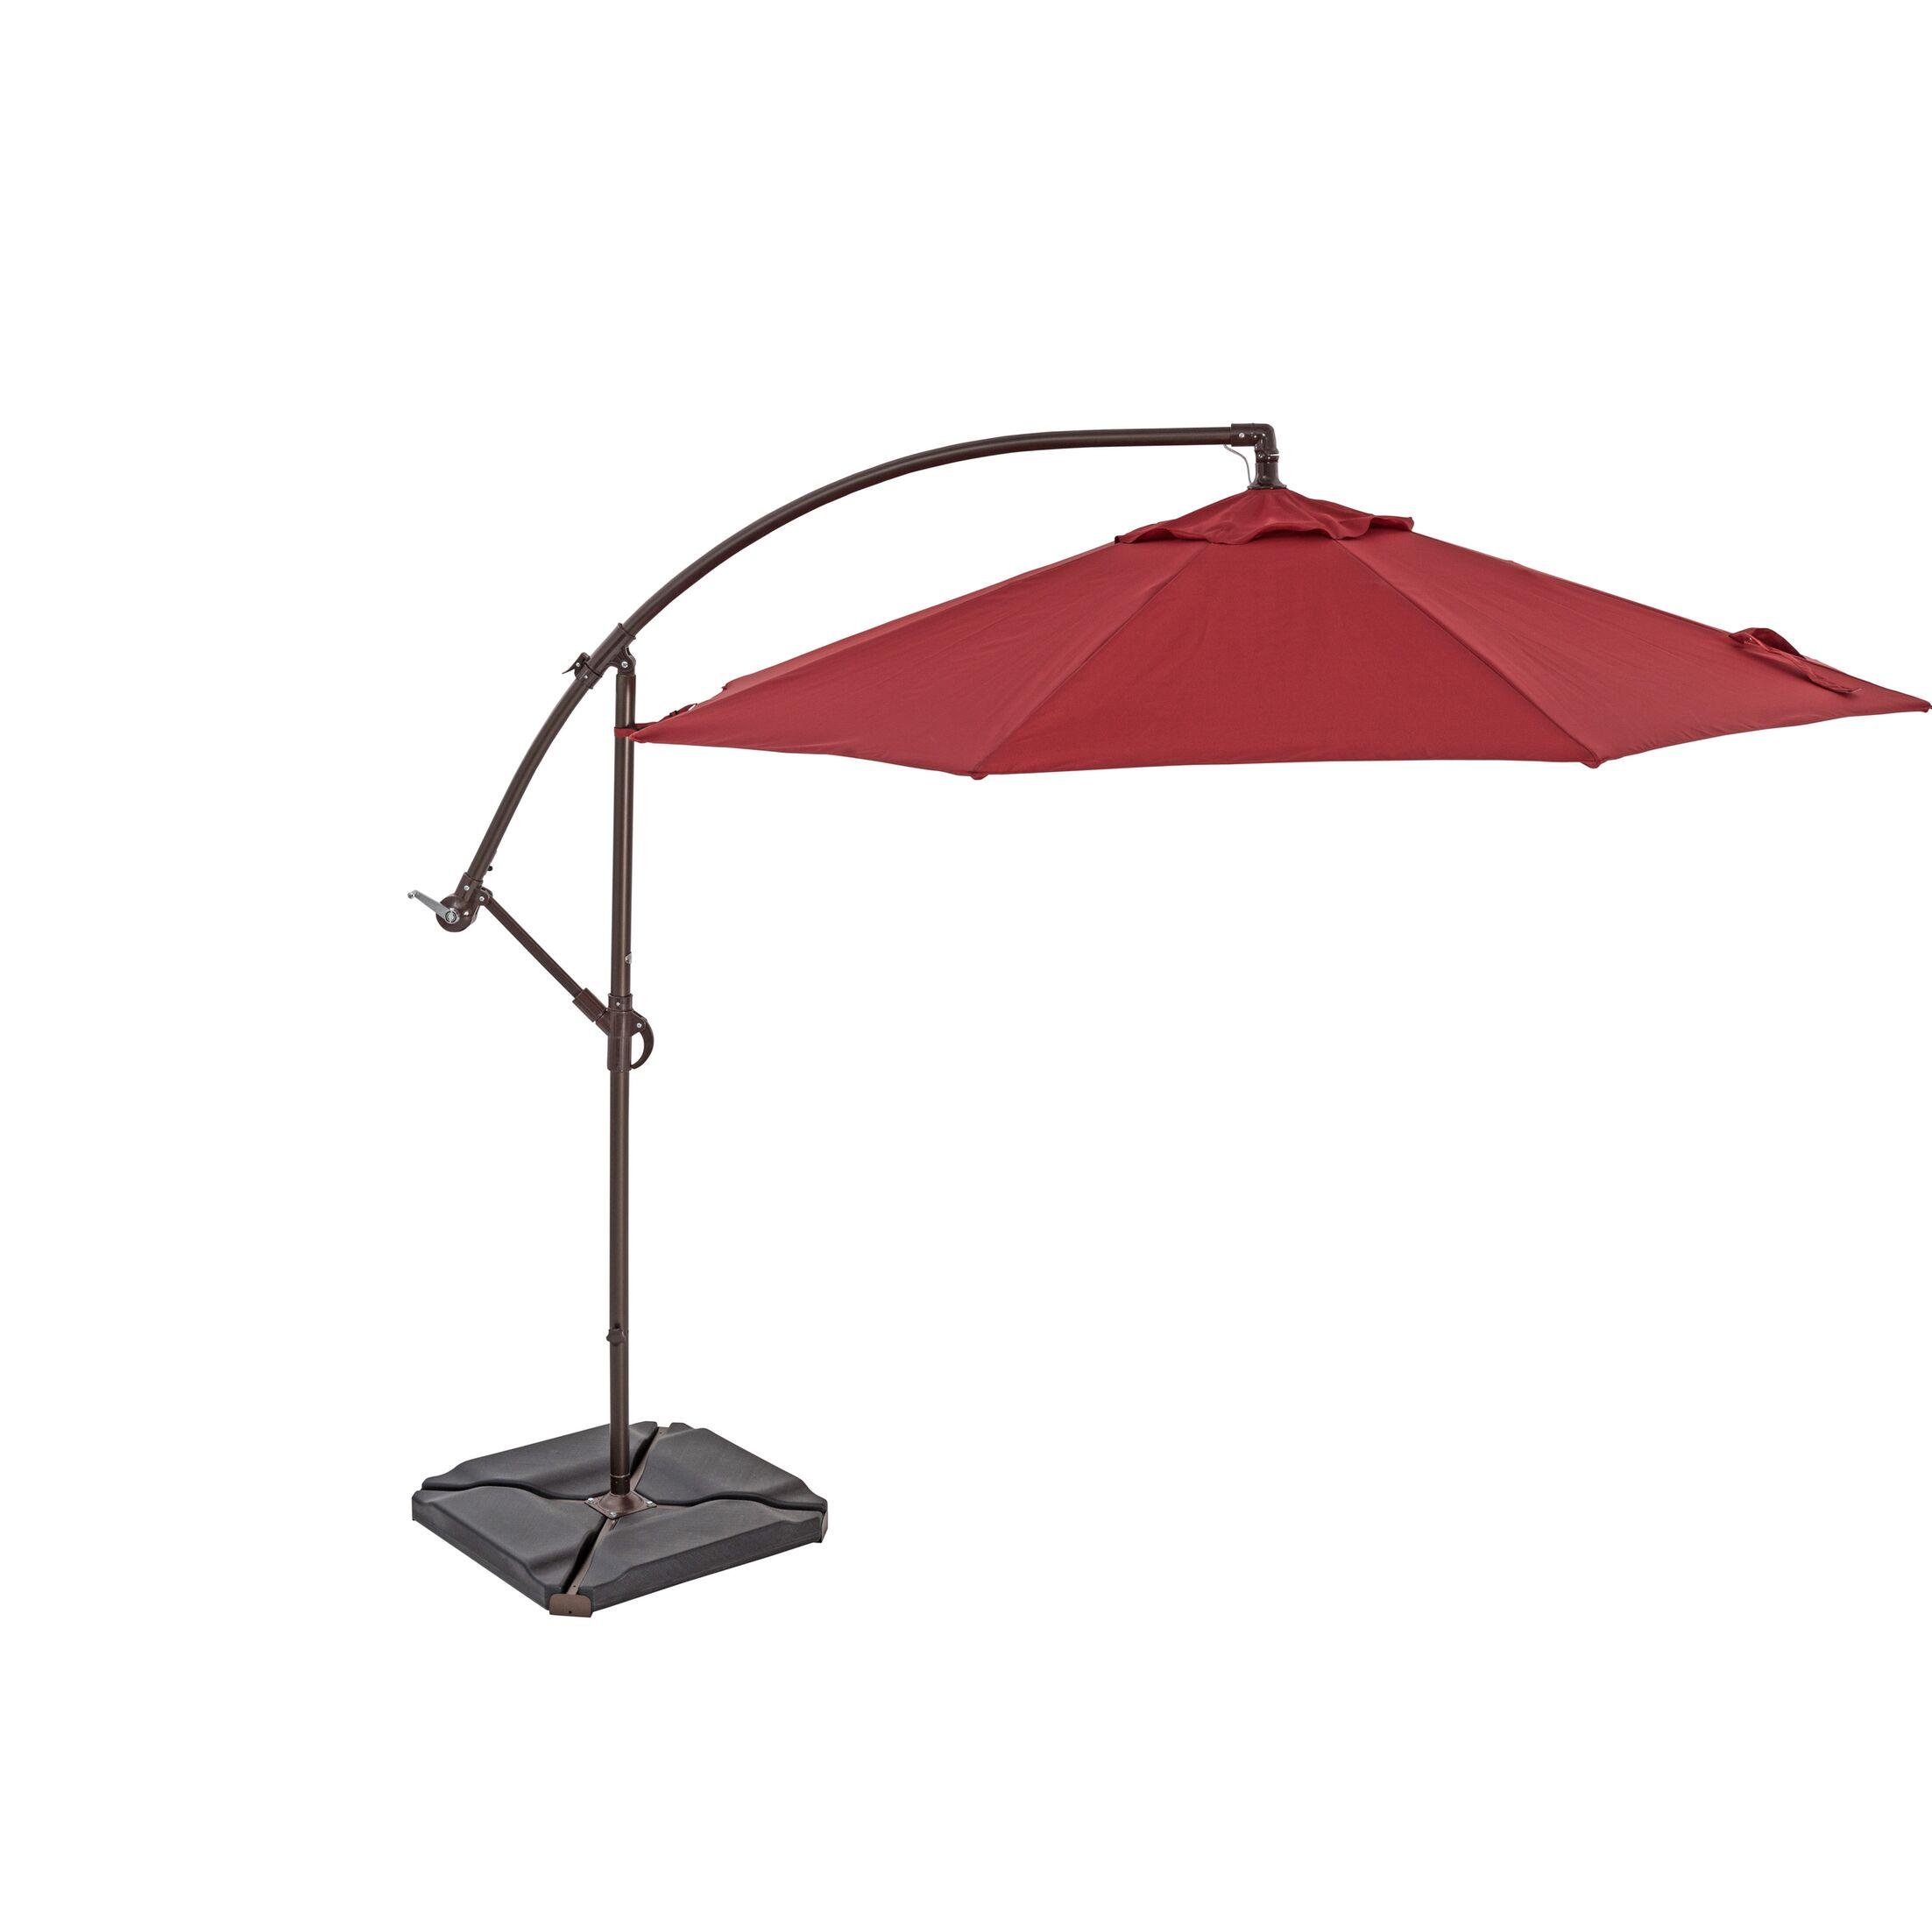 10' Cantilever Umbrella Color: Jockey Red